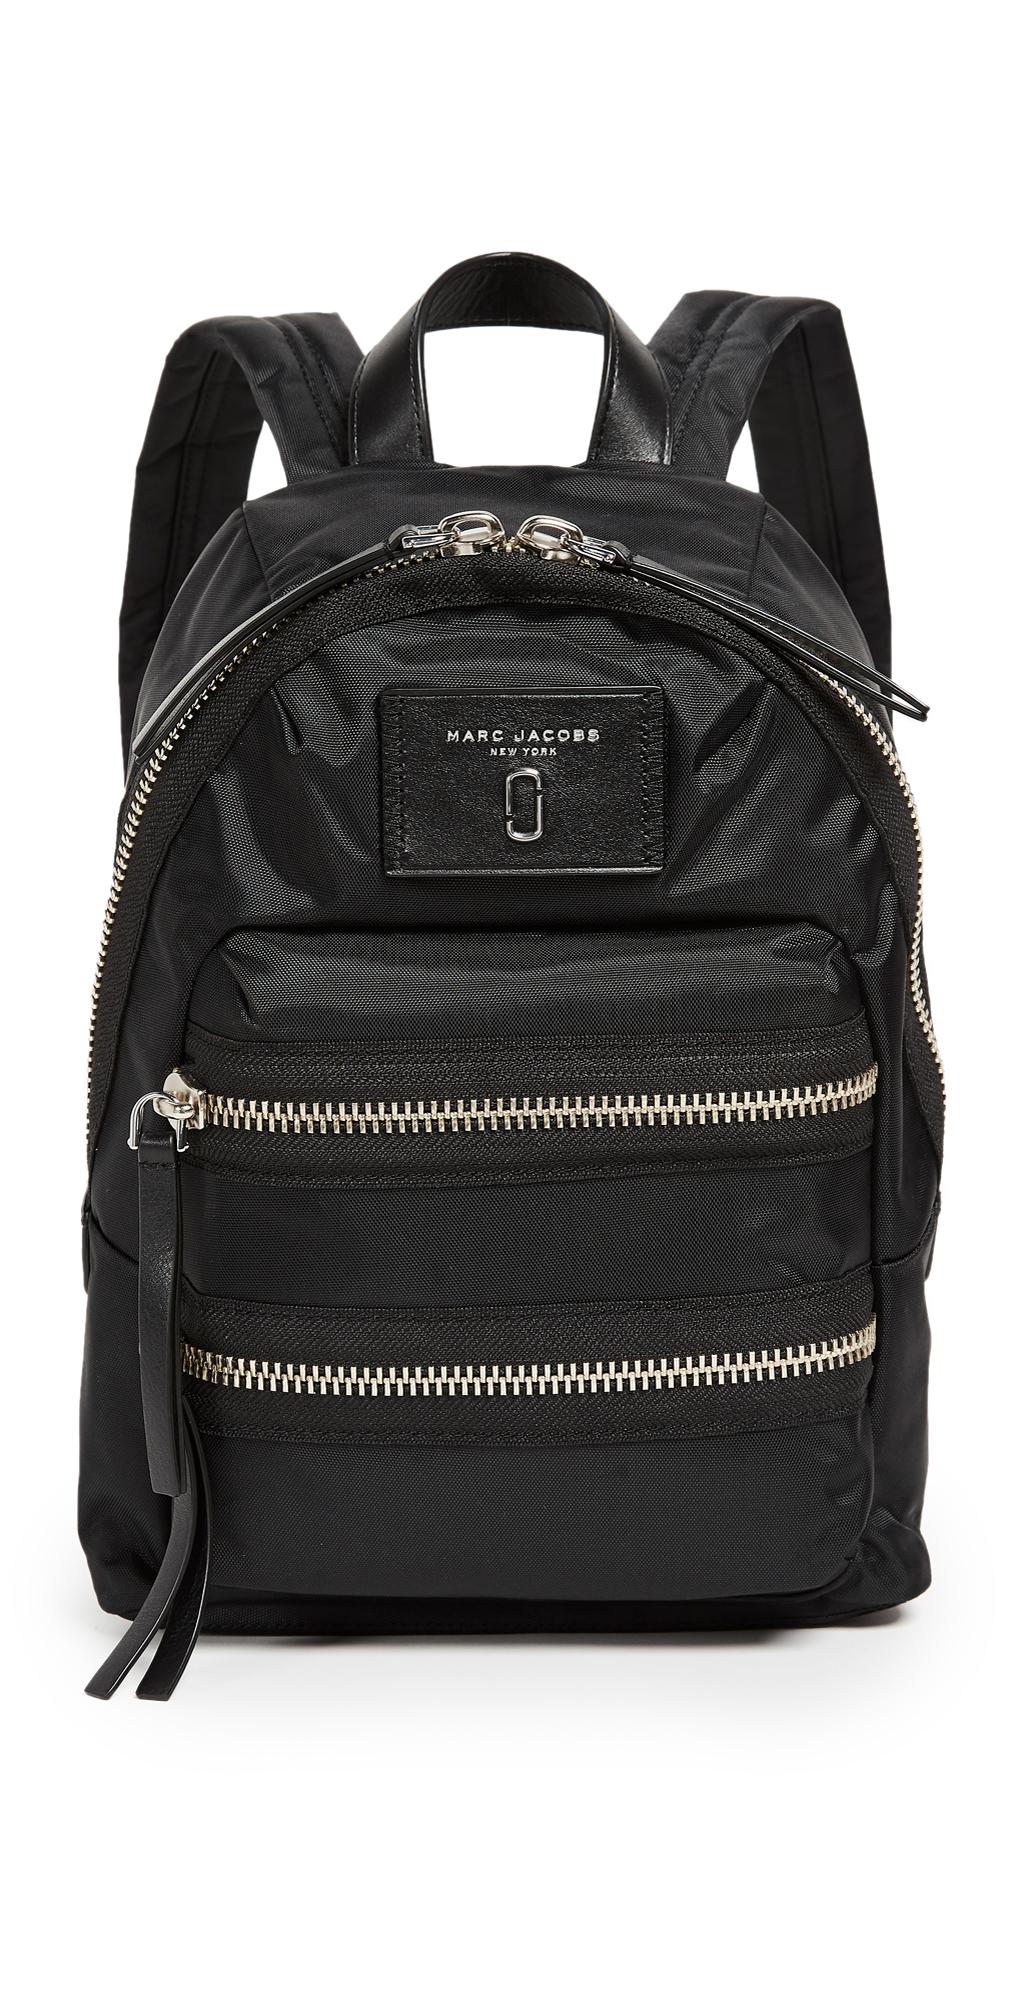 The Marc Jacobs Mini Nylon Biker Backpack